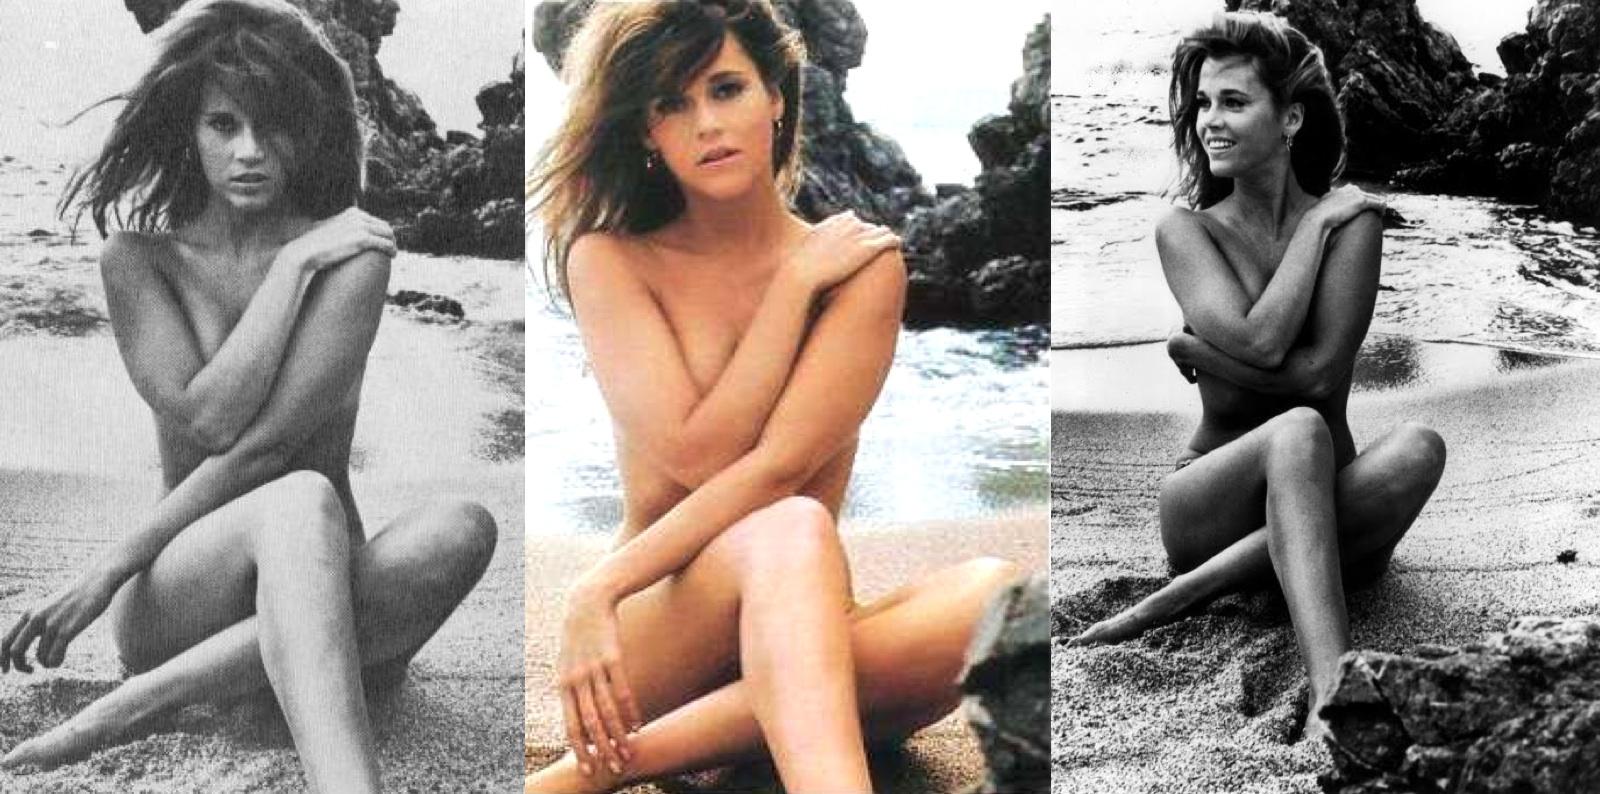 http://2.bp.blogspot.com/-CEga1lTBUNw/TfJ5MIHt2NI/AAAAAAAACrU/fntMQ46R-n4/s1600/Jane+Fonda_ocean.jpg